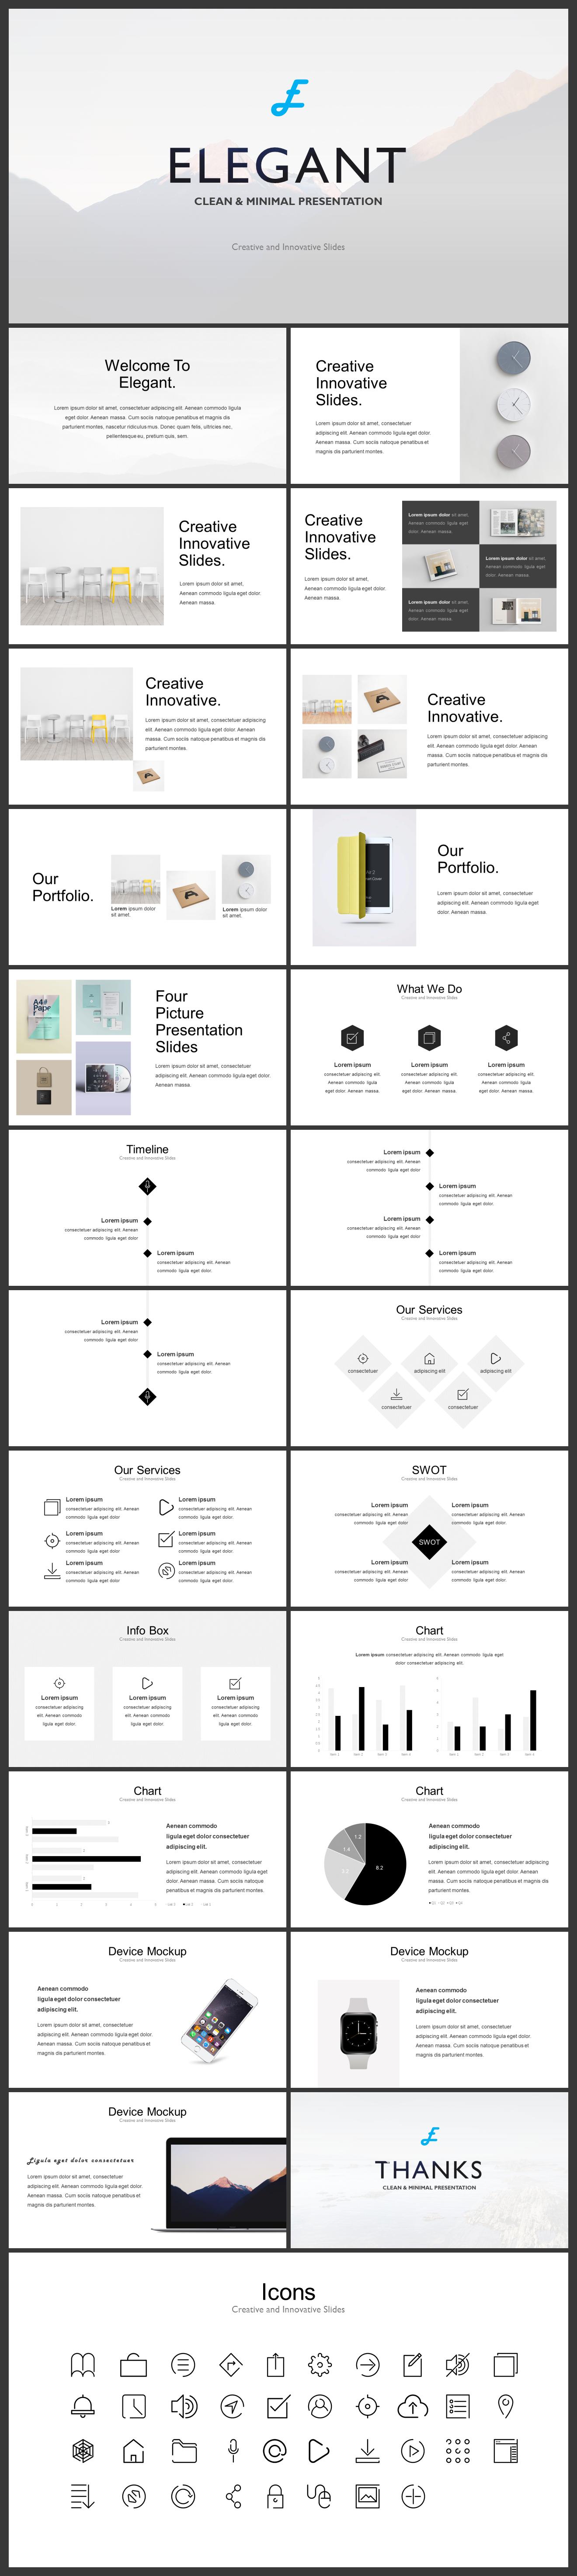 ELEGANT CLEAN MINIMAL PRESENTATION PRE - Elegant clean & minimal presentation - swot, simple, Mockup, minimal, elegant, Creative, clean